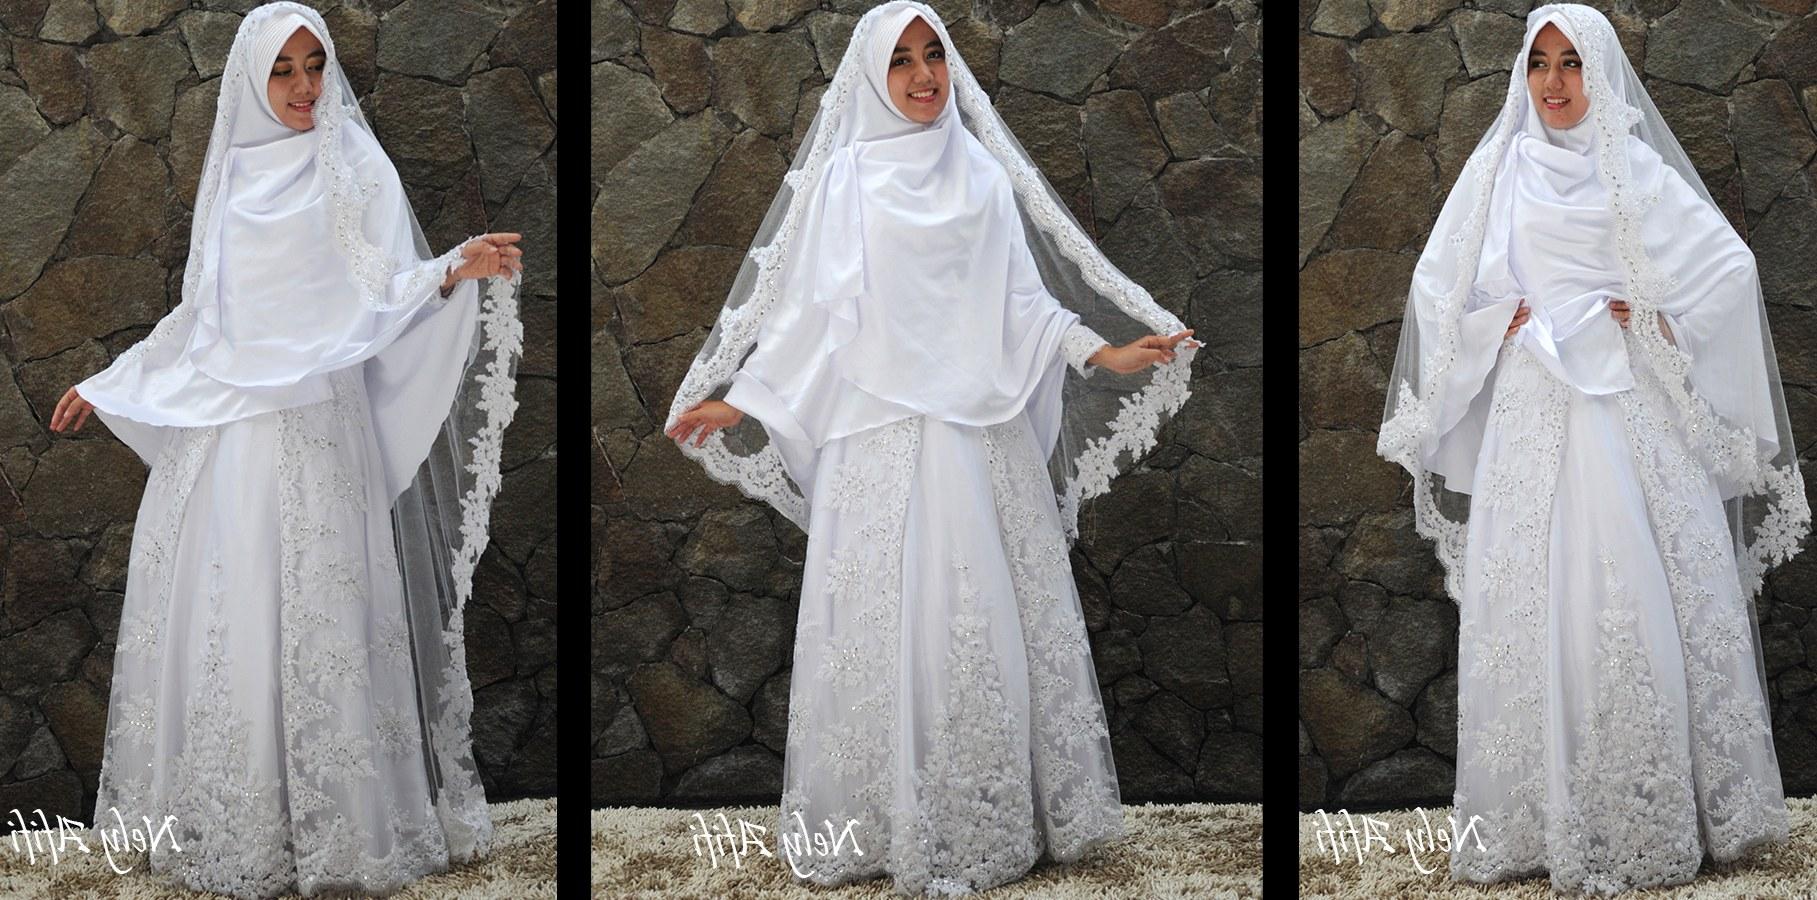 Design Gaun Pengantin Muslimah Syar'i Rabbani H9d9 Baju Pengantin Muslimah Syar I Inspirasi Pernikahan